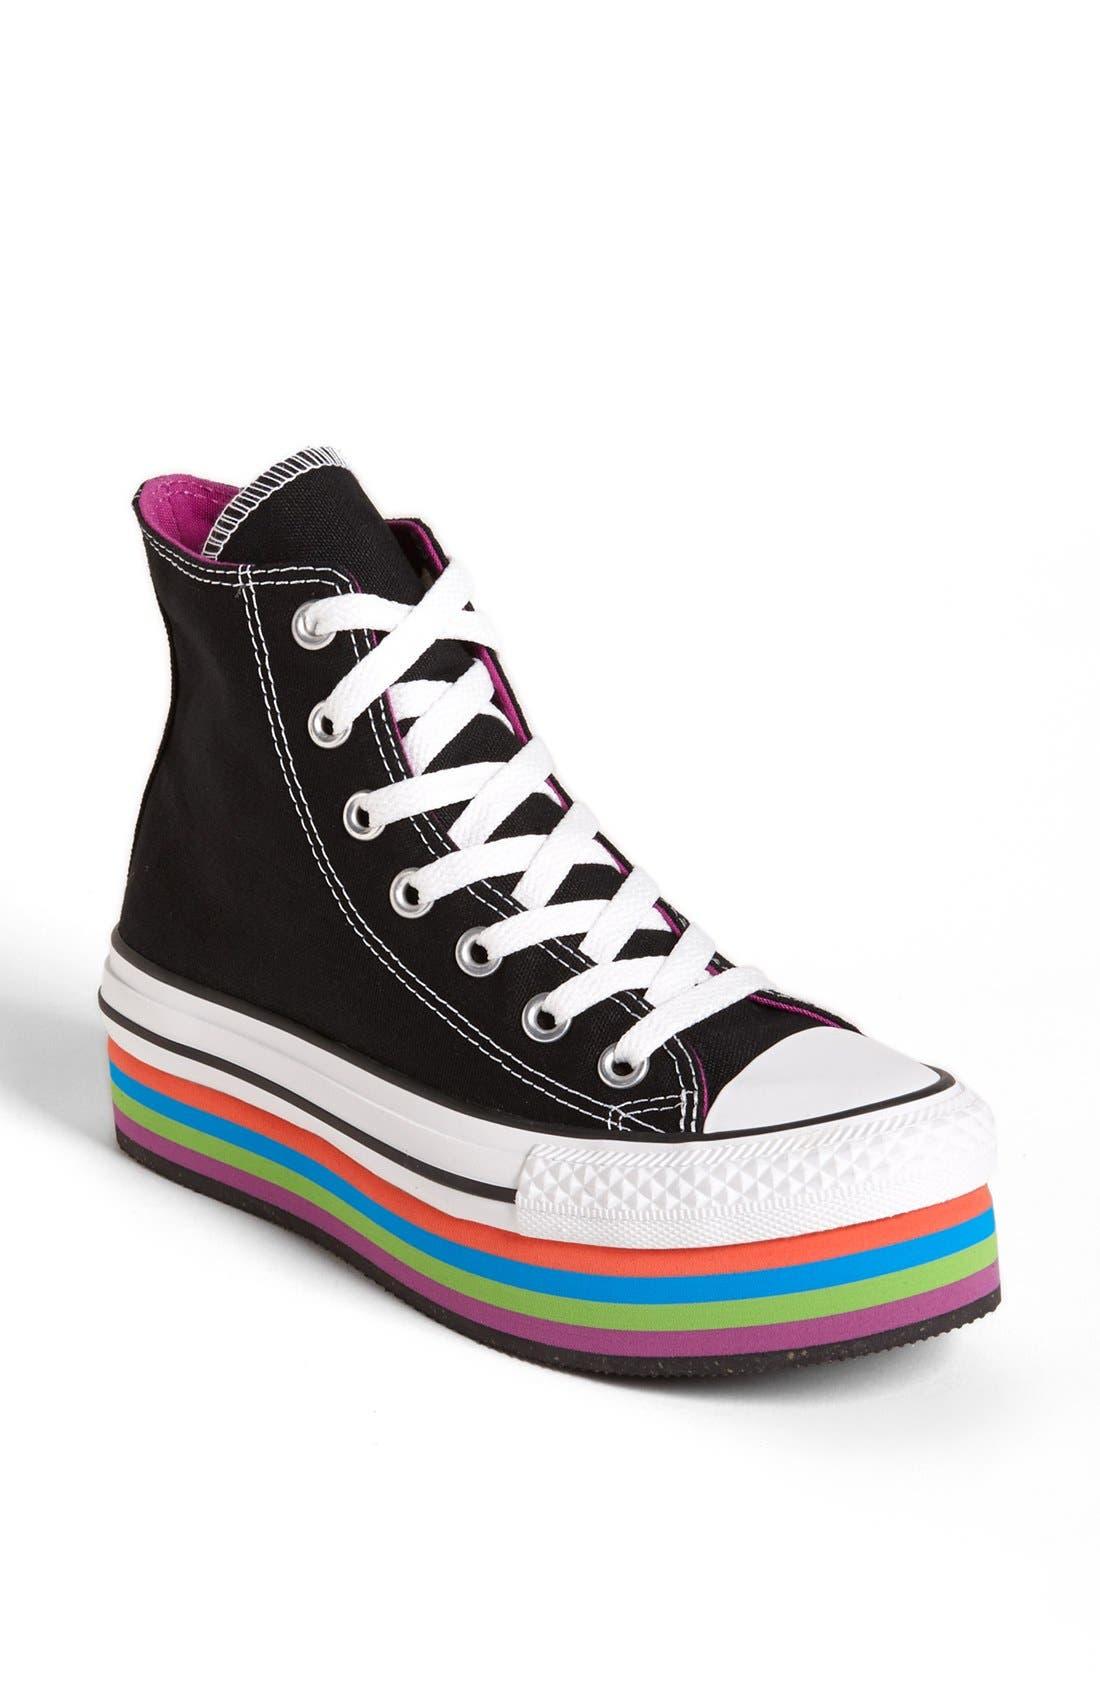 Alternate Image 1 Selected - Converse Chuck Taylor® All Star® Platform High Top Sneaker (Women)